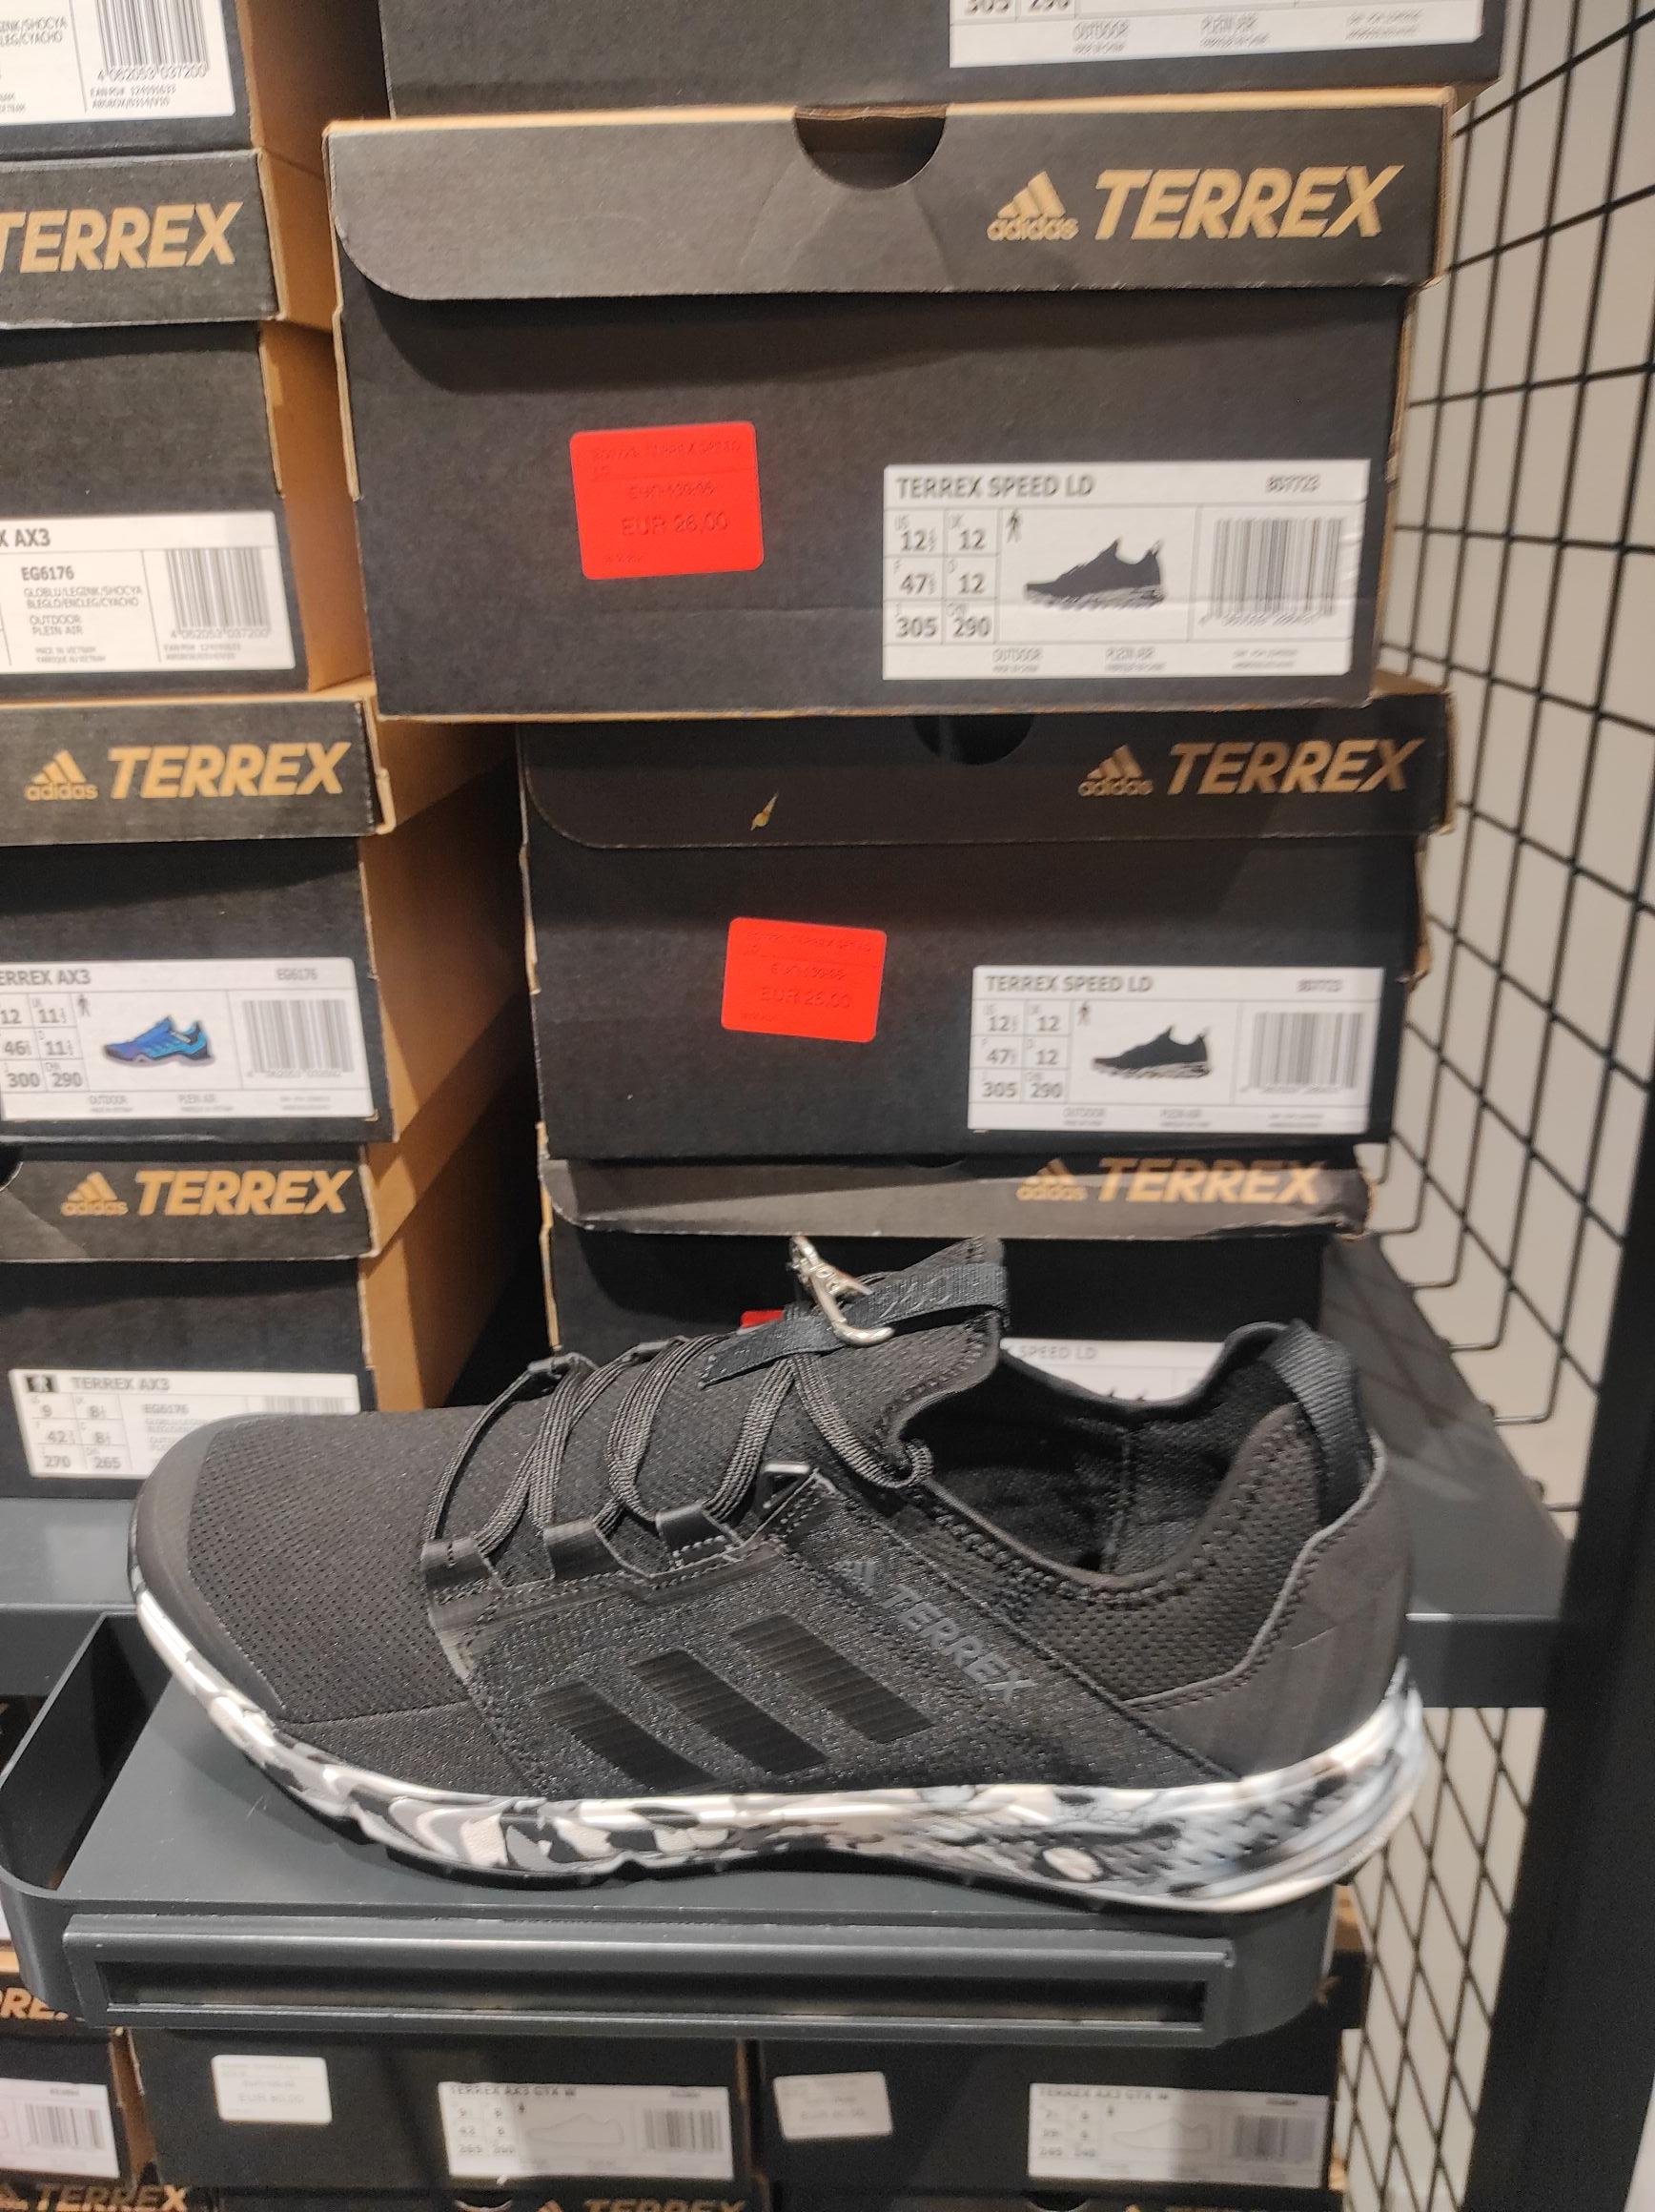 Adidas Terrex Speed LD n° 47 1/3 (Megapark Barakaldo)